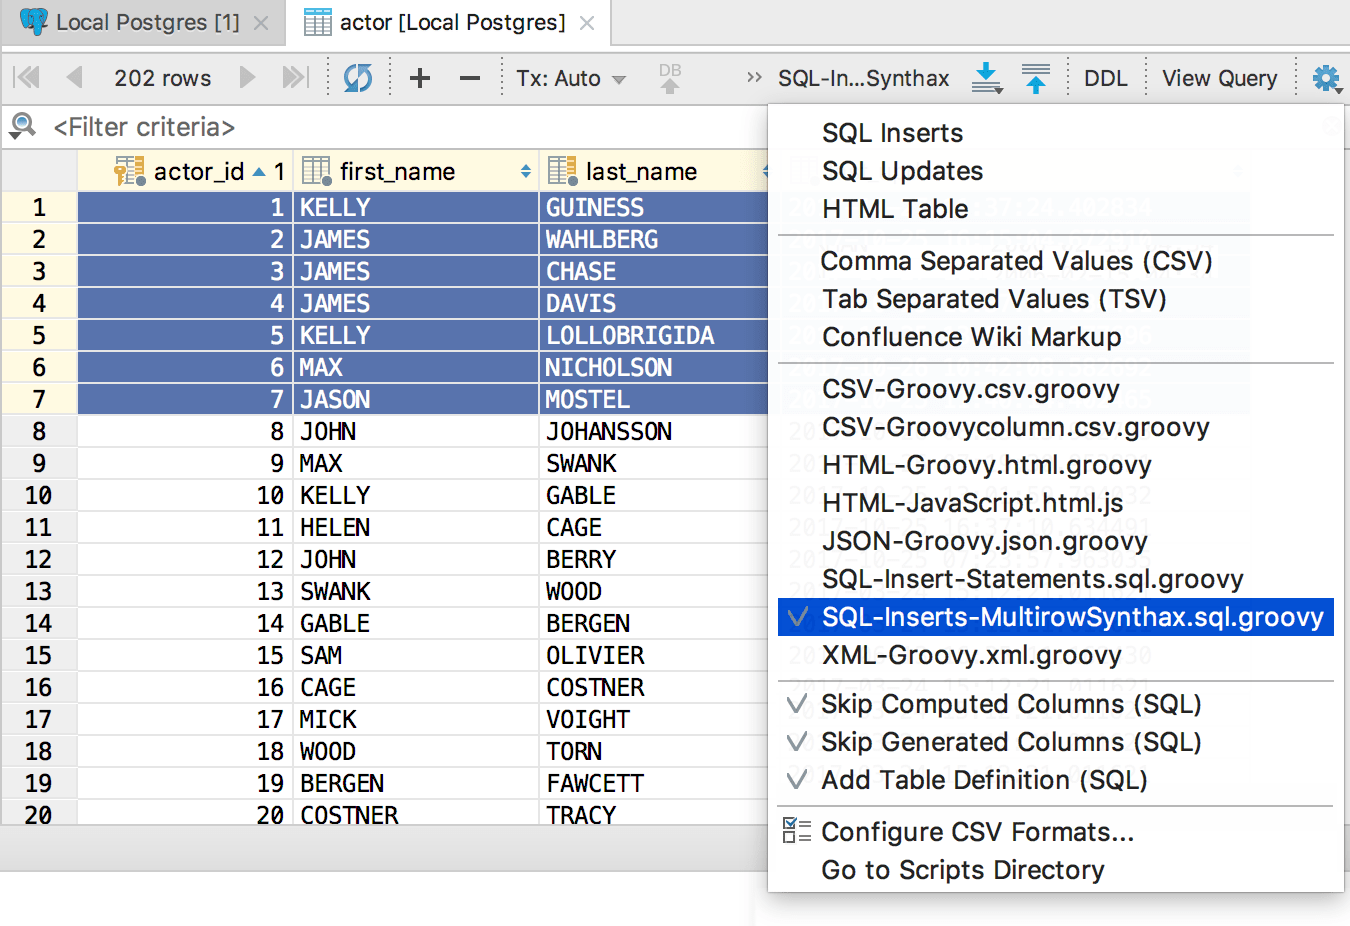 Select the script in the menu